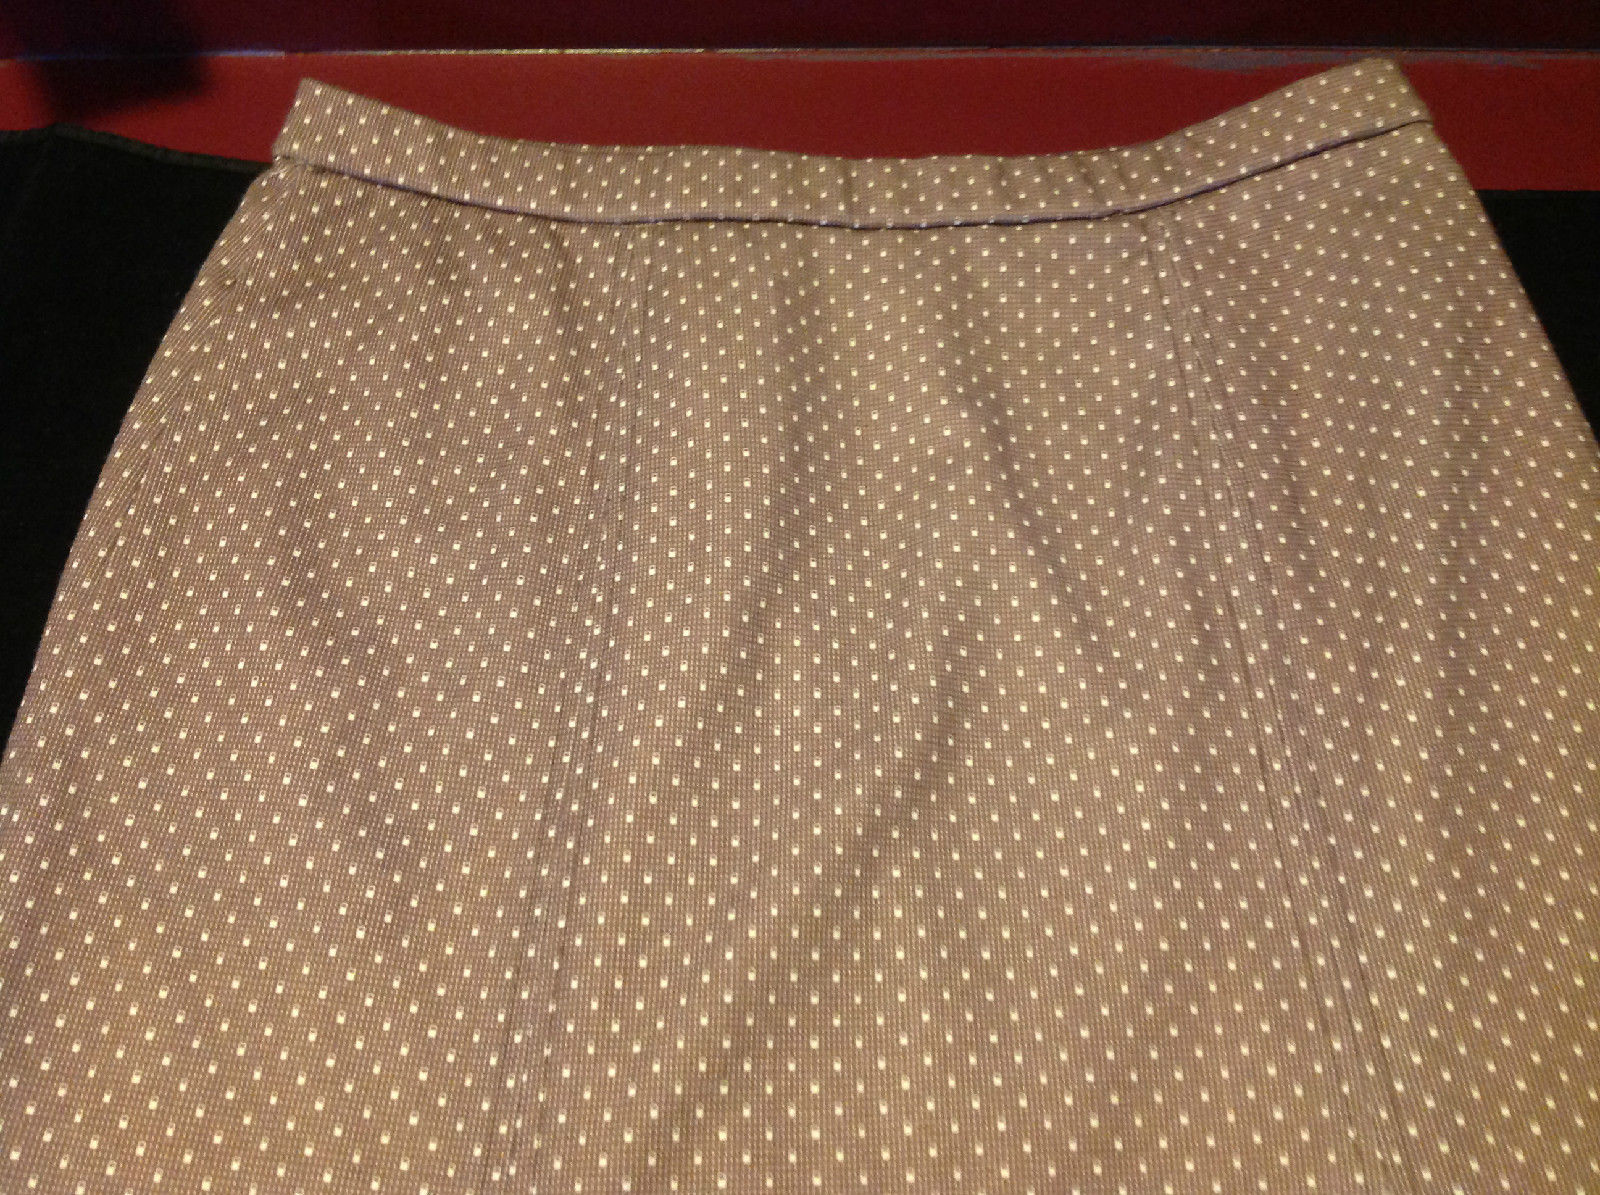 Ladies Wilroy Traveler Brown Skirt with White Polka Dots Size 10